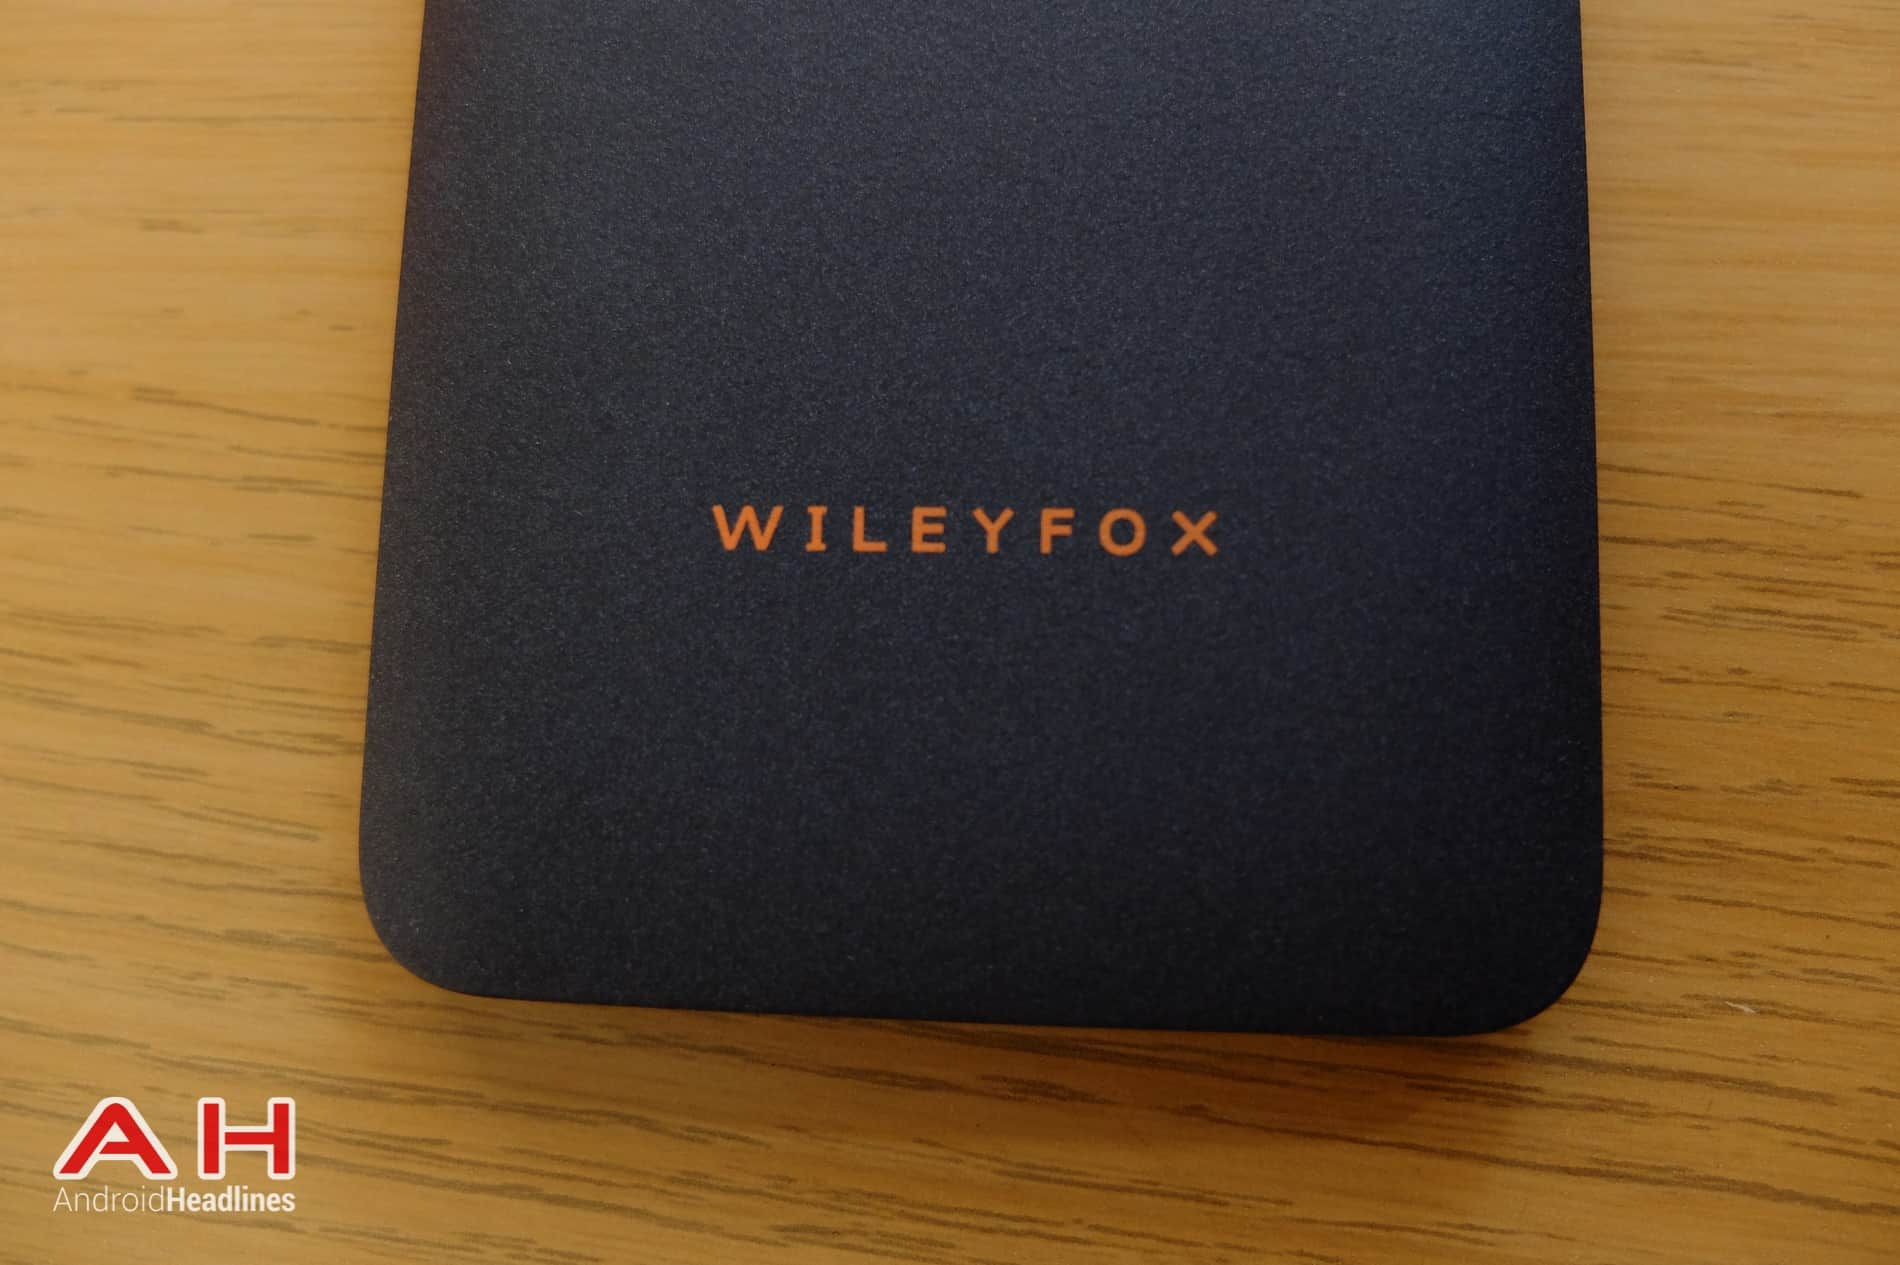 WileyFox Swift AH 25